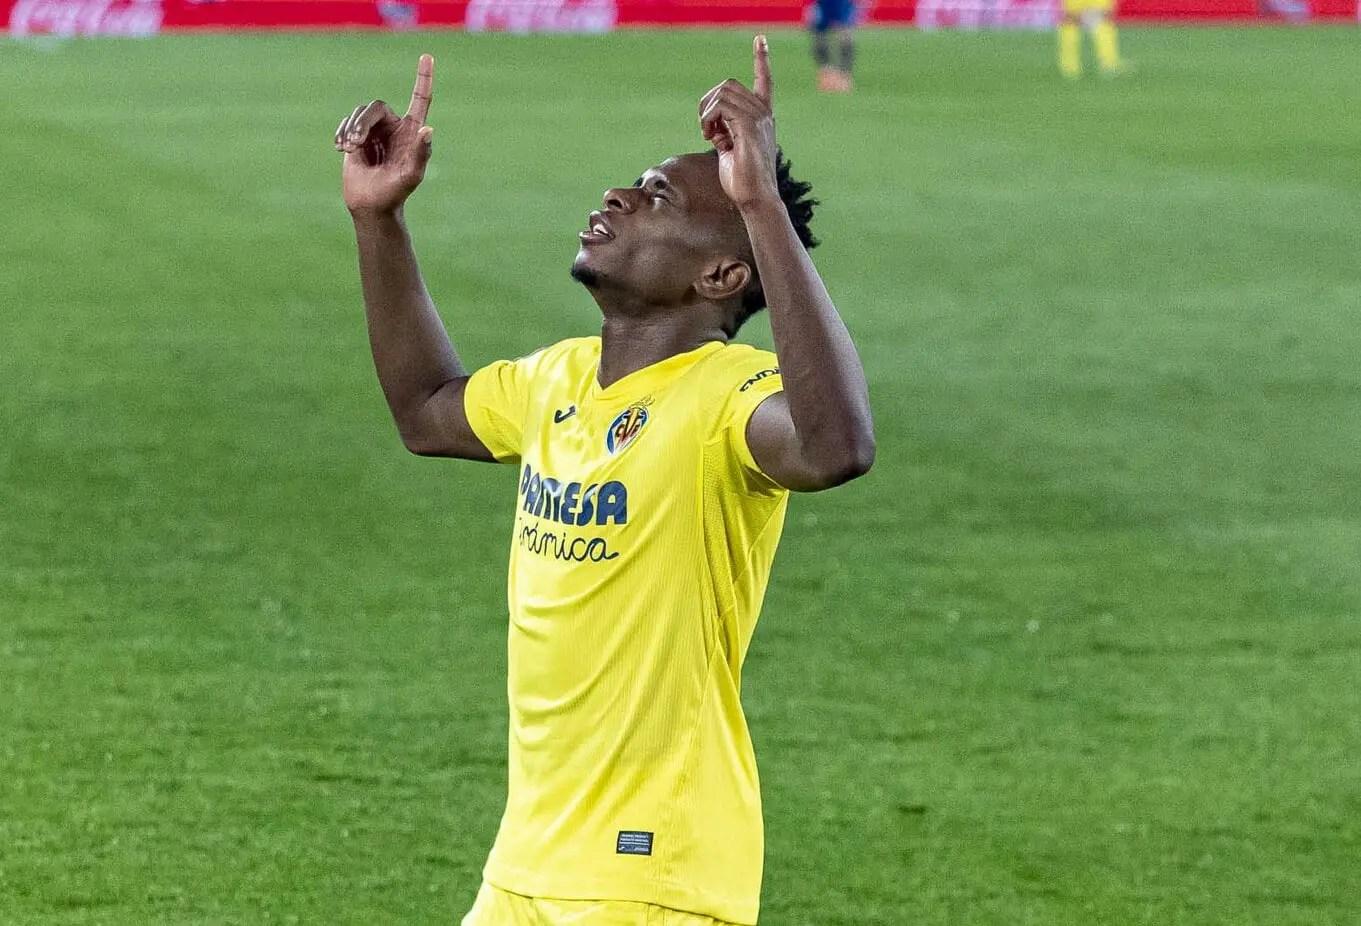 Laliga: Chukwueze Nets Brace As Villarreal Thrash Levante, Move Up To Europa Qualification Spot